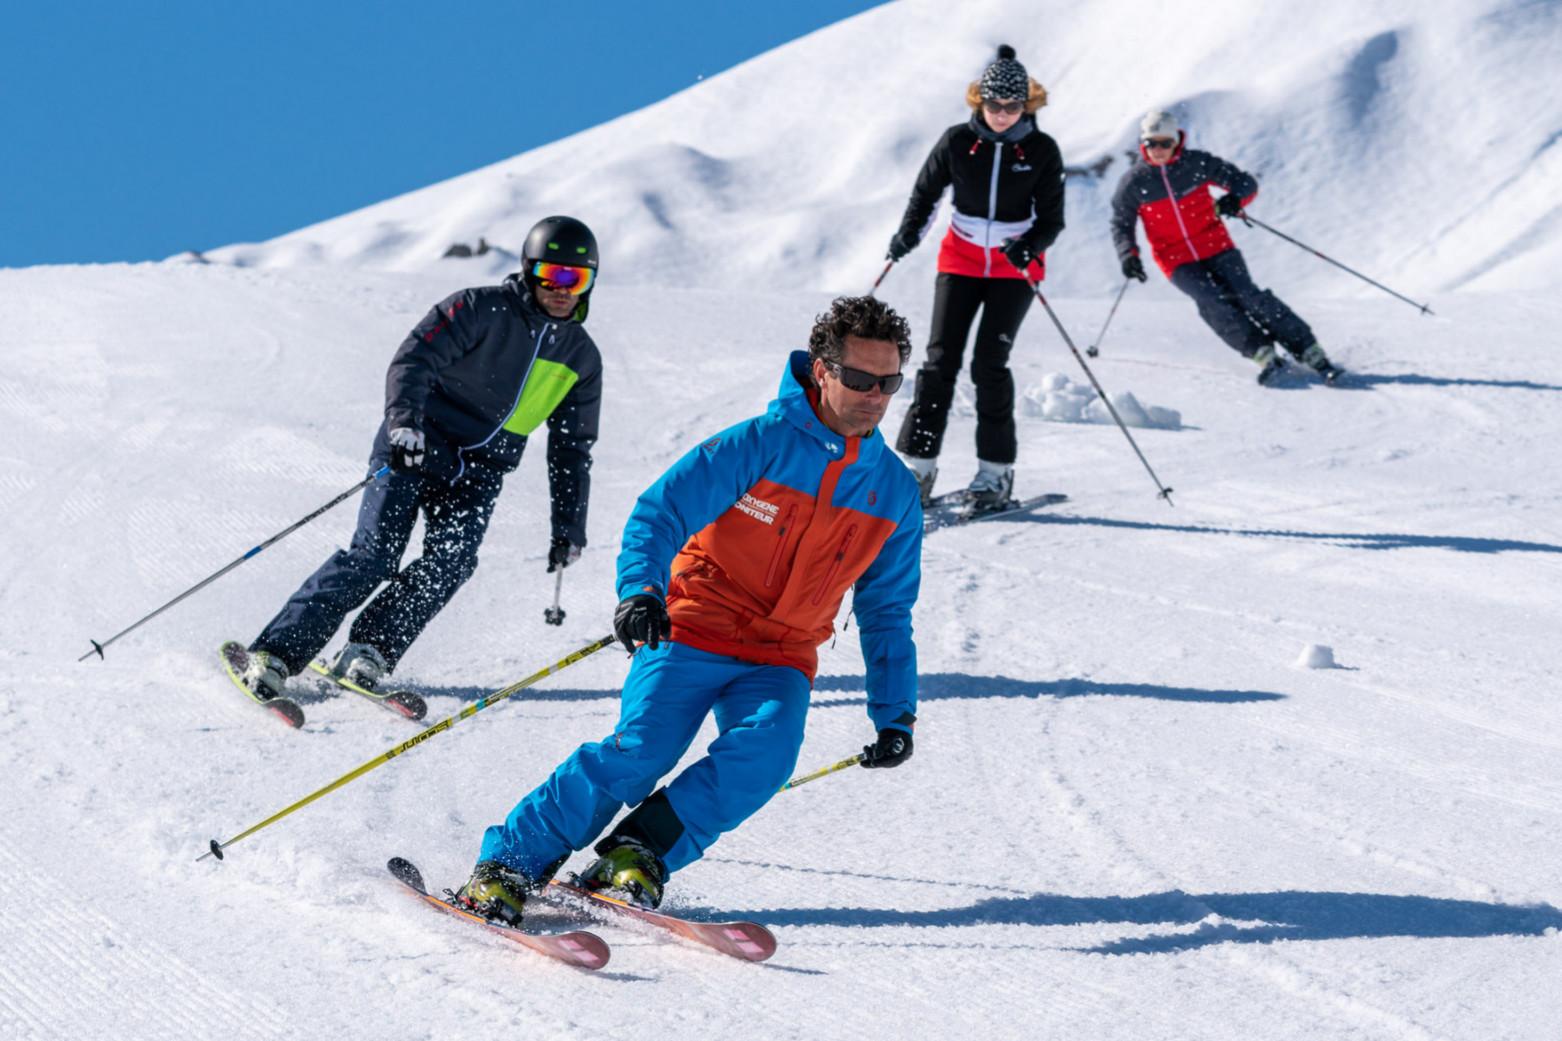 Ski session with friends in Megève